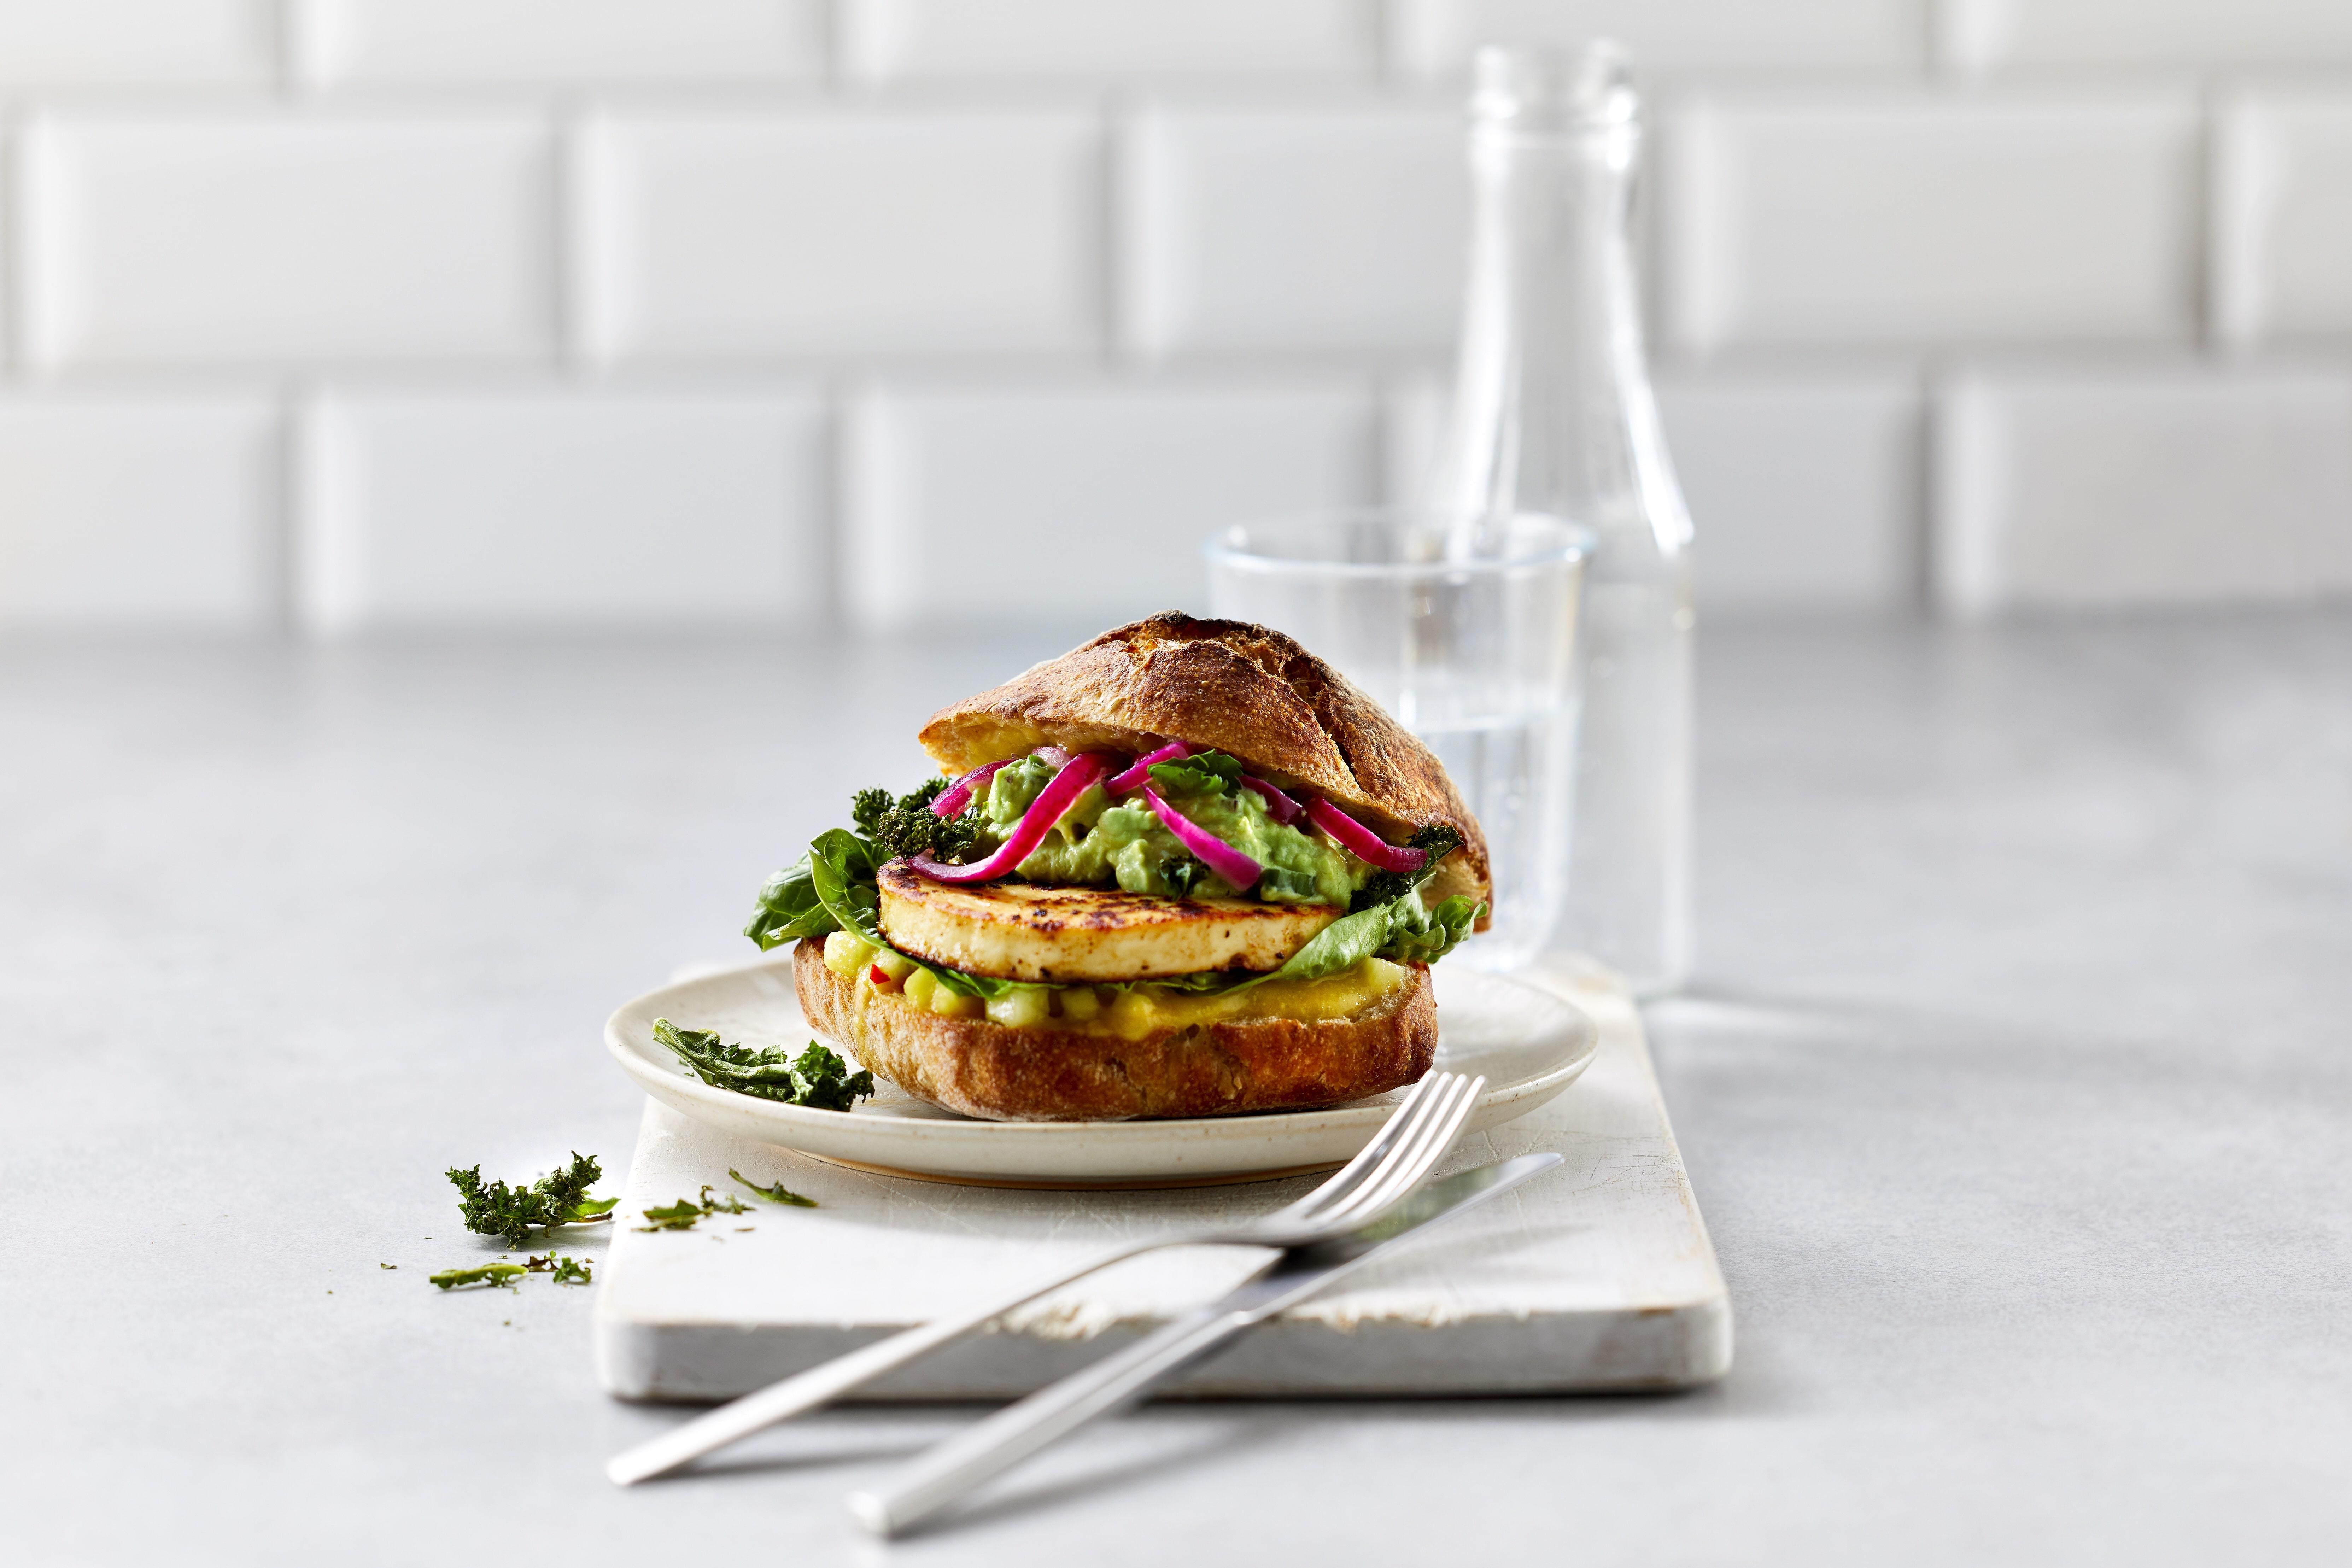 Grillkäse Burger Salat Arla